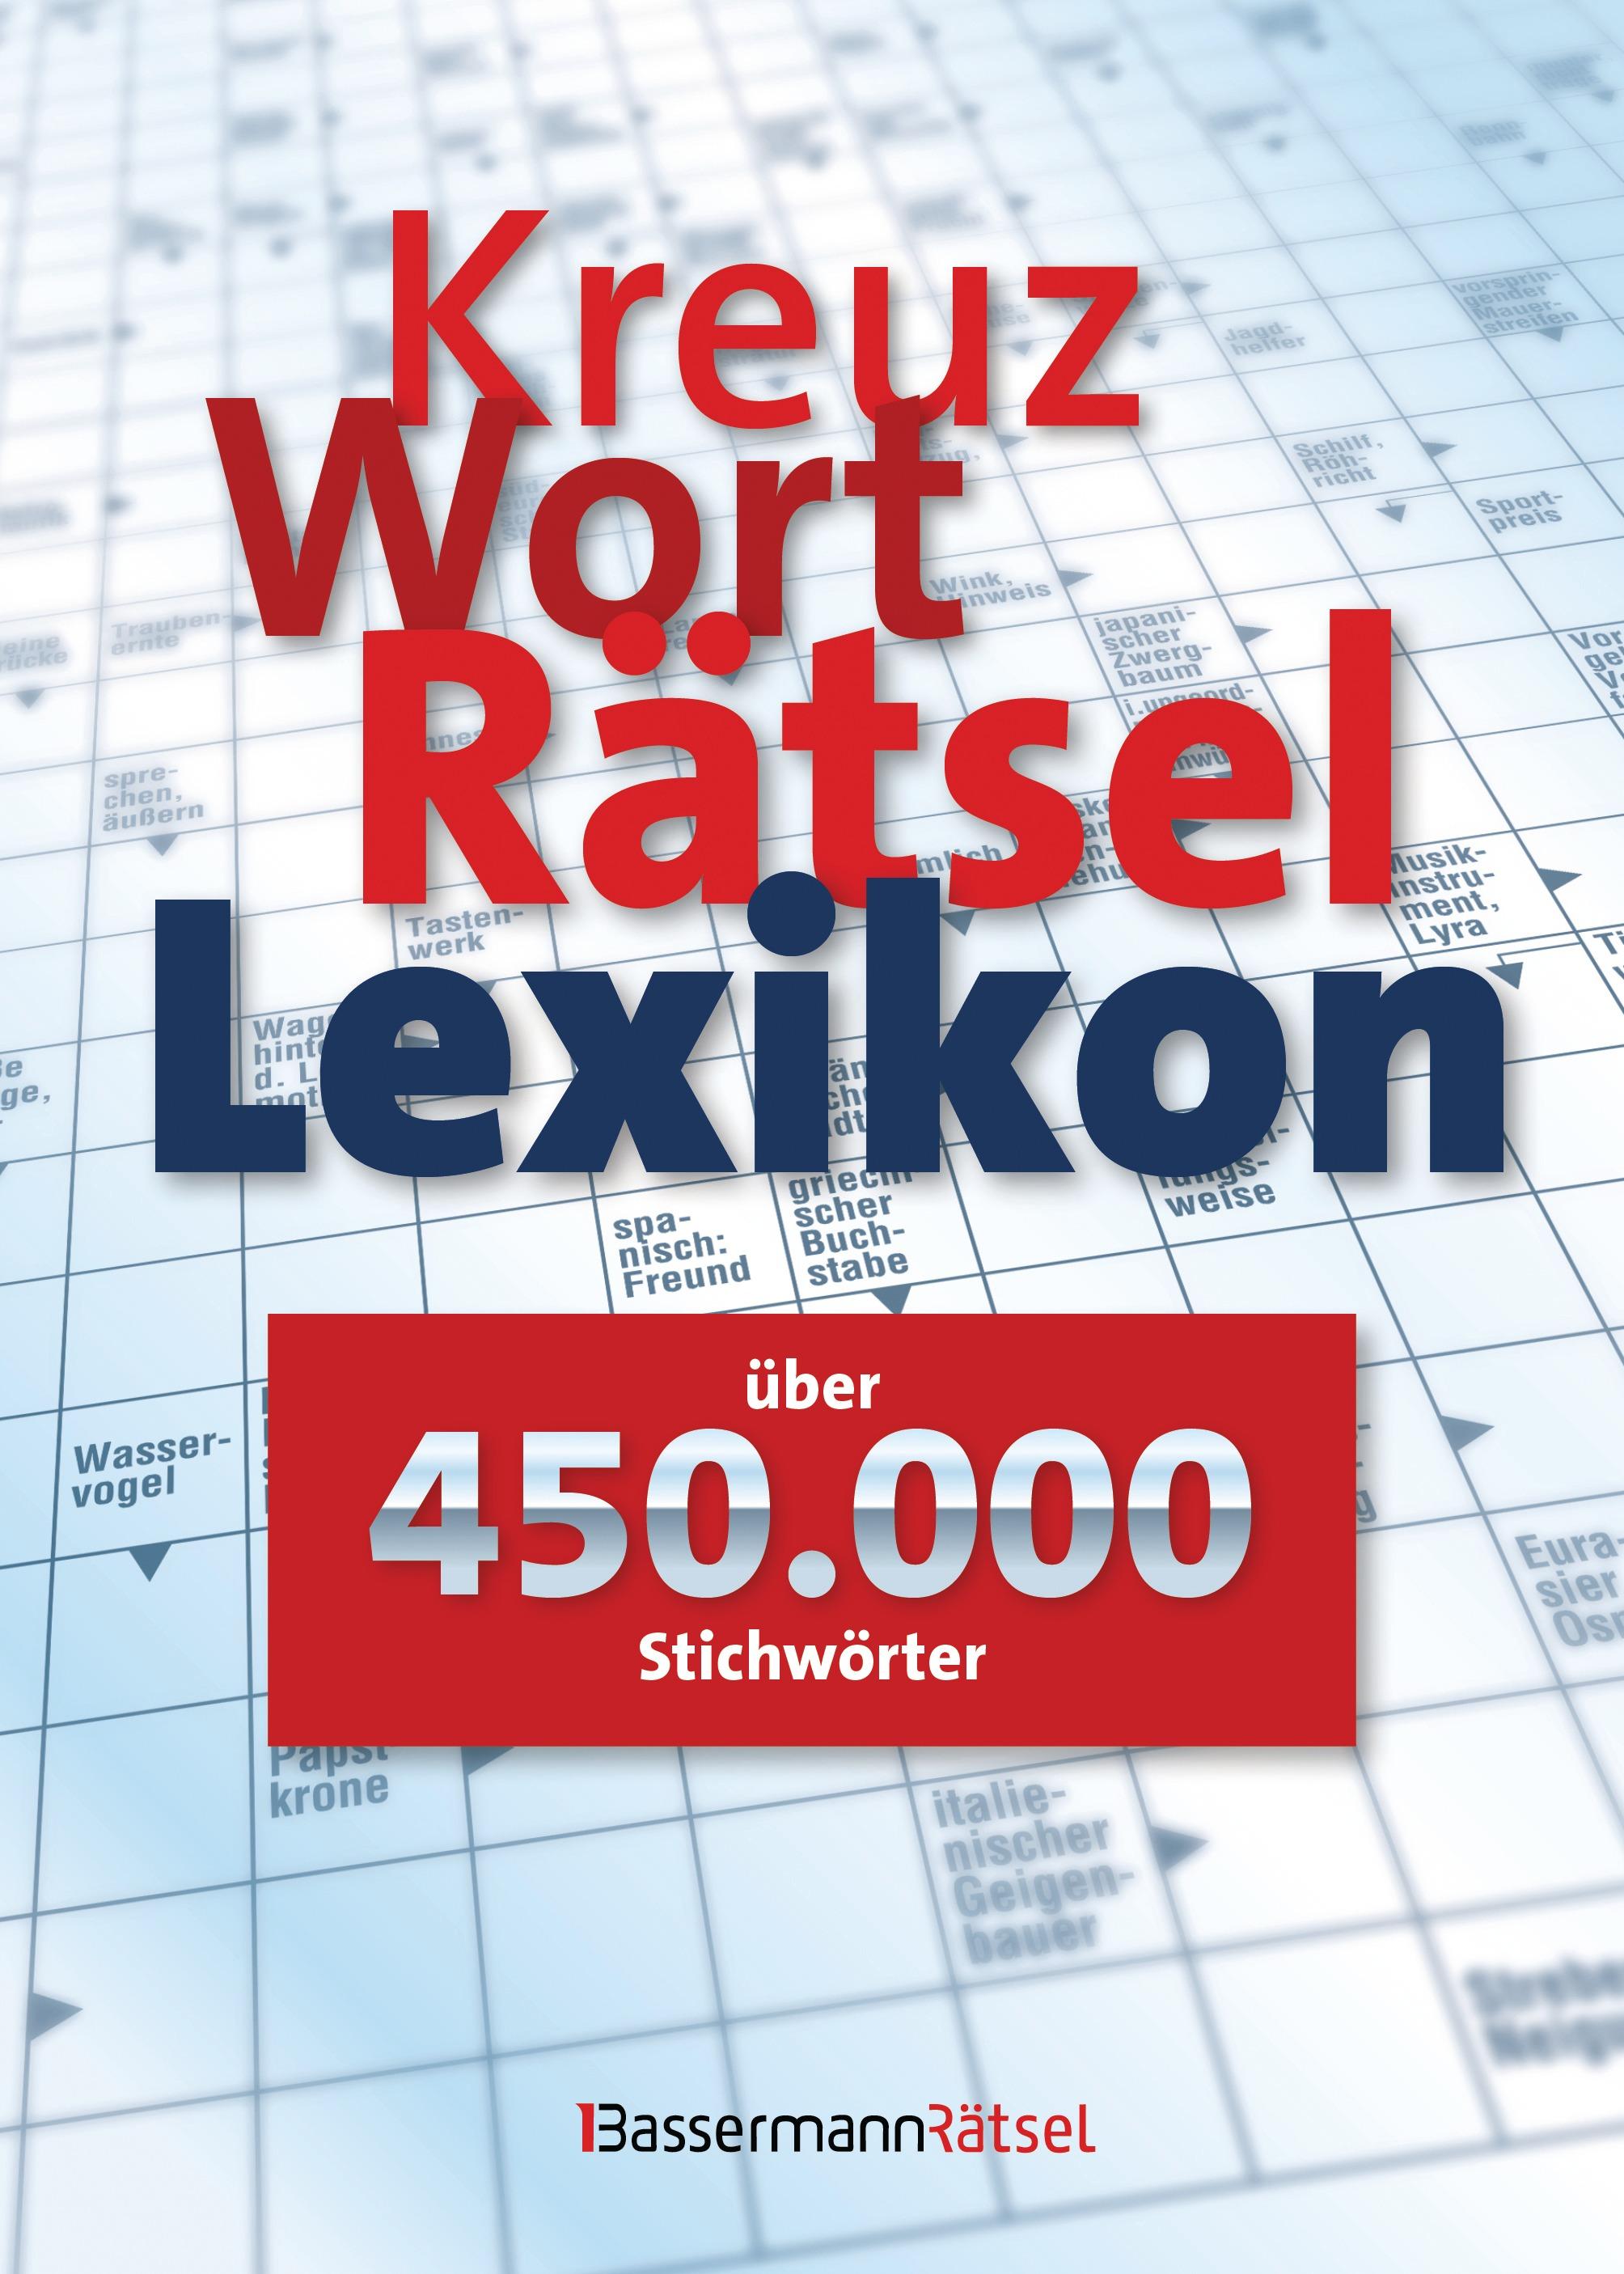 Kreuzworträtsellexikon über 450000 Stichwörter Bassermann Rätsel